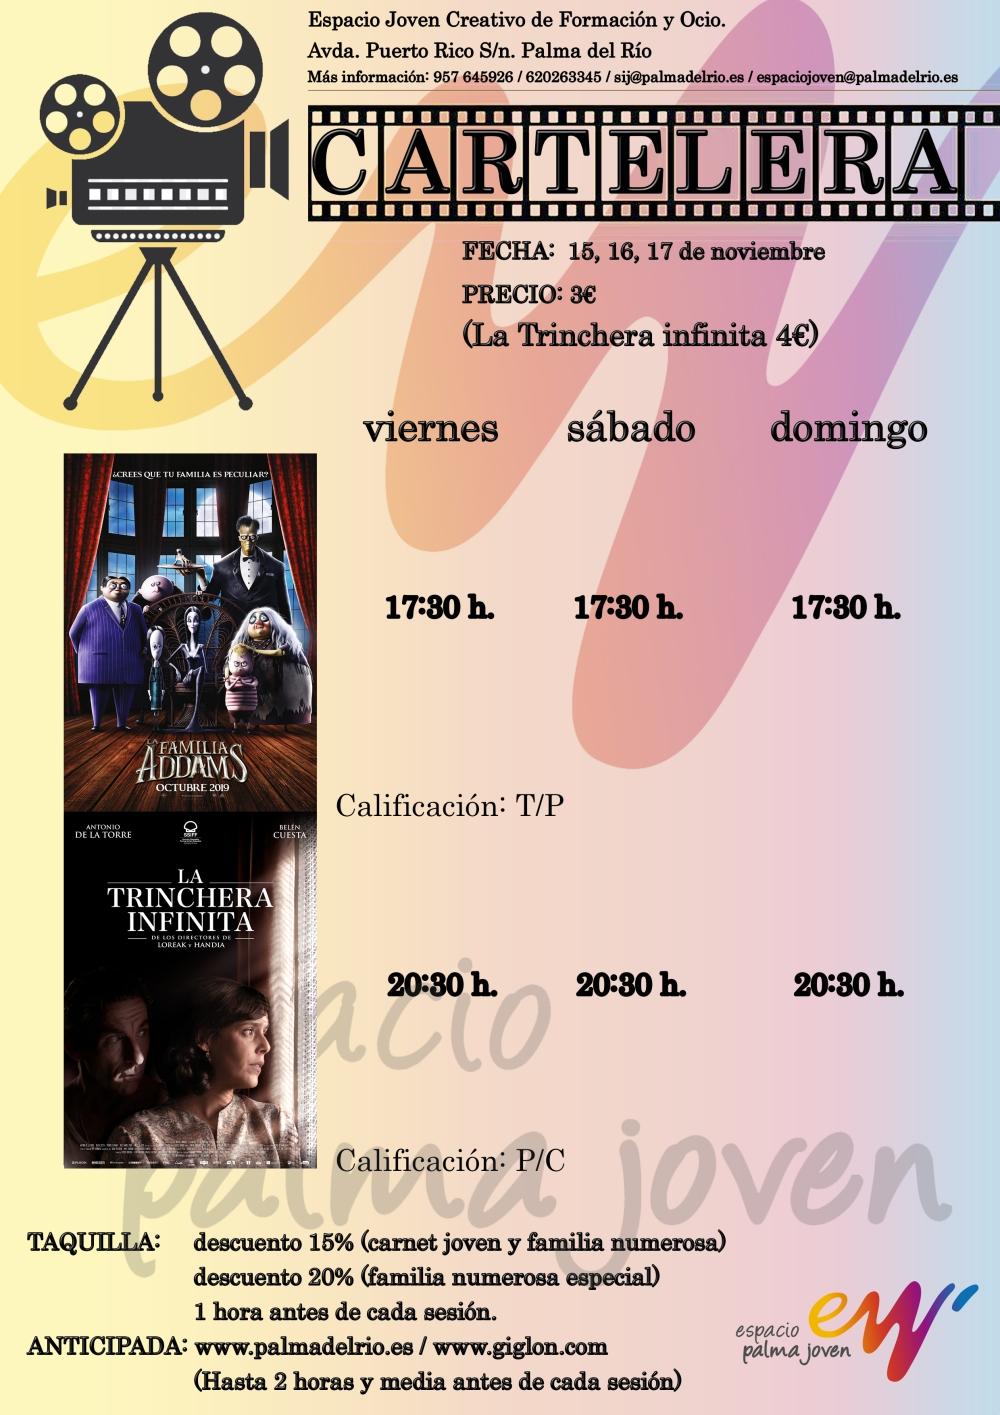 https://www.palmadelrio.es/sites/default/files/horario_cine_15_16_17_nov_2.jpg